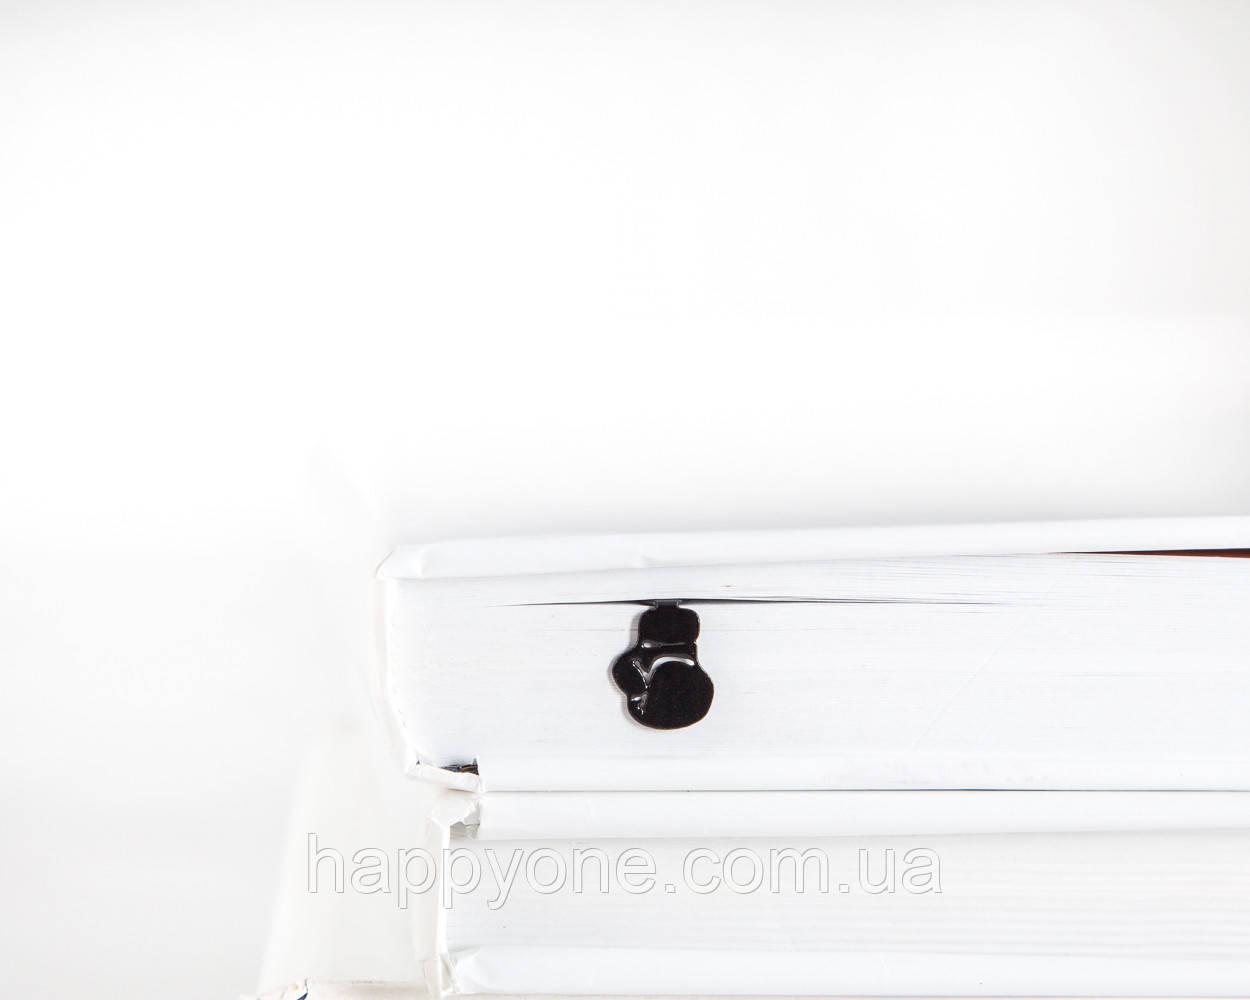 Закладка для книг Боксёрская перчатка